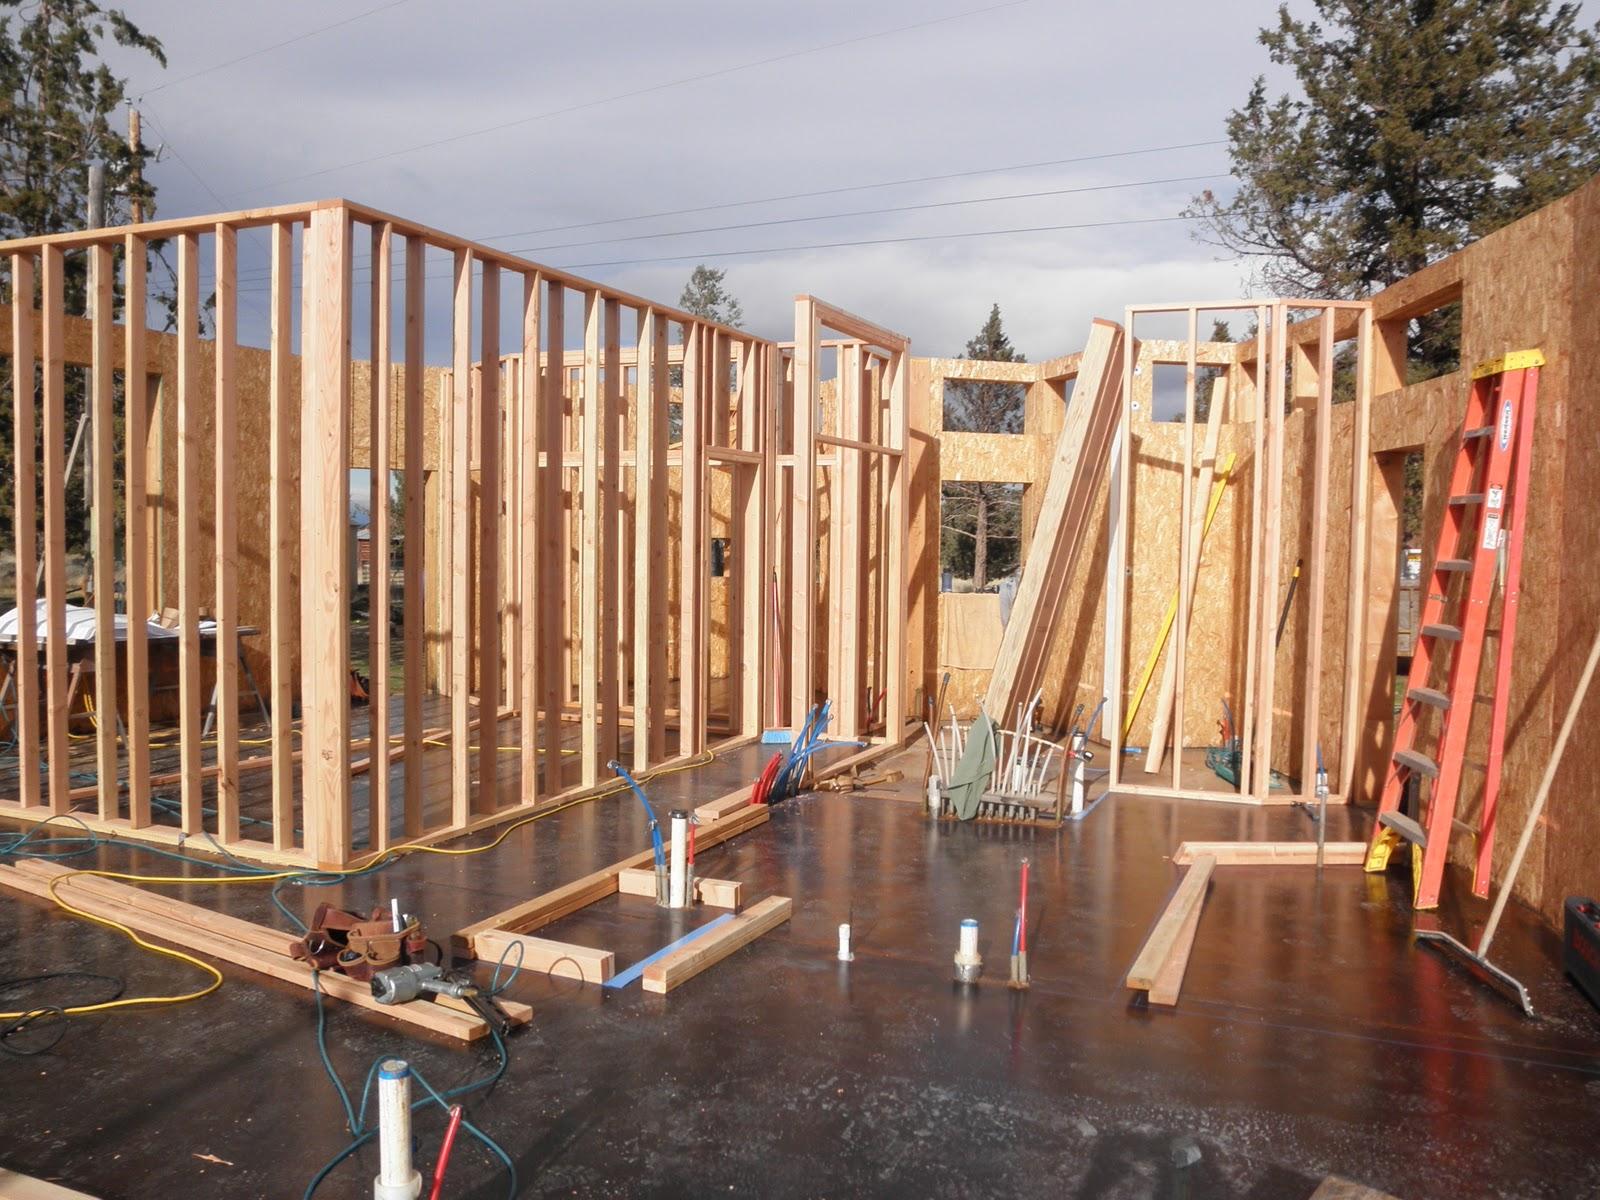 2x6 Wall Framing Construction : Roundup ranch nov framed double block walls